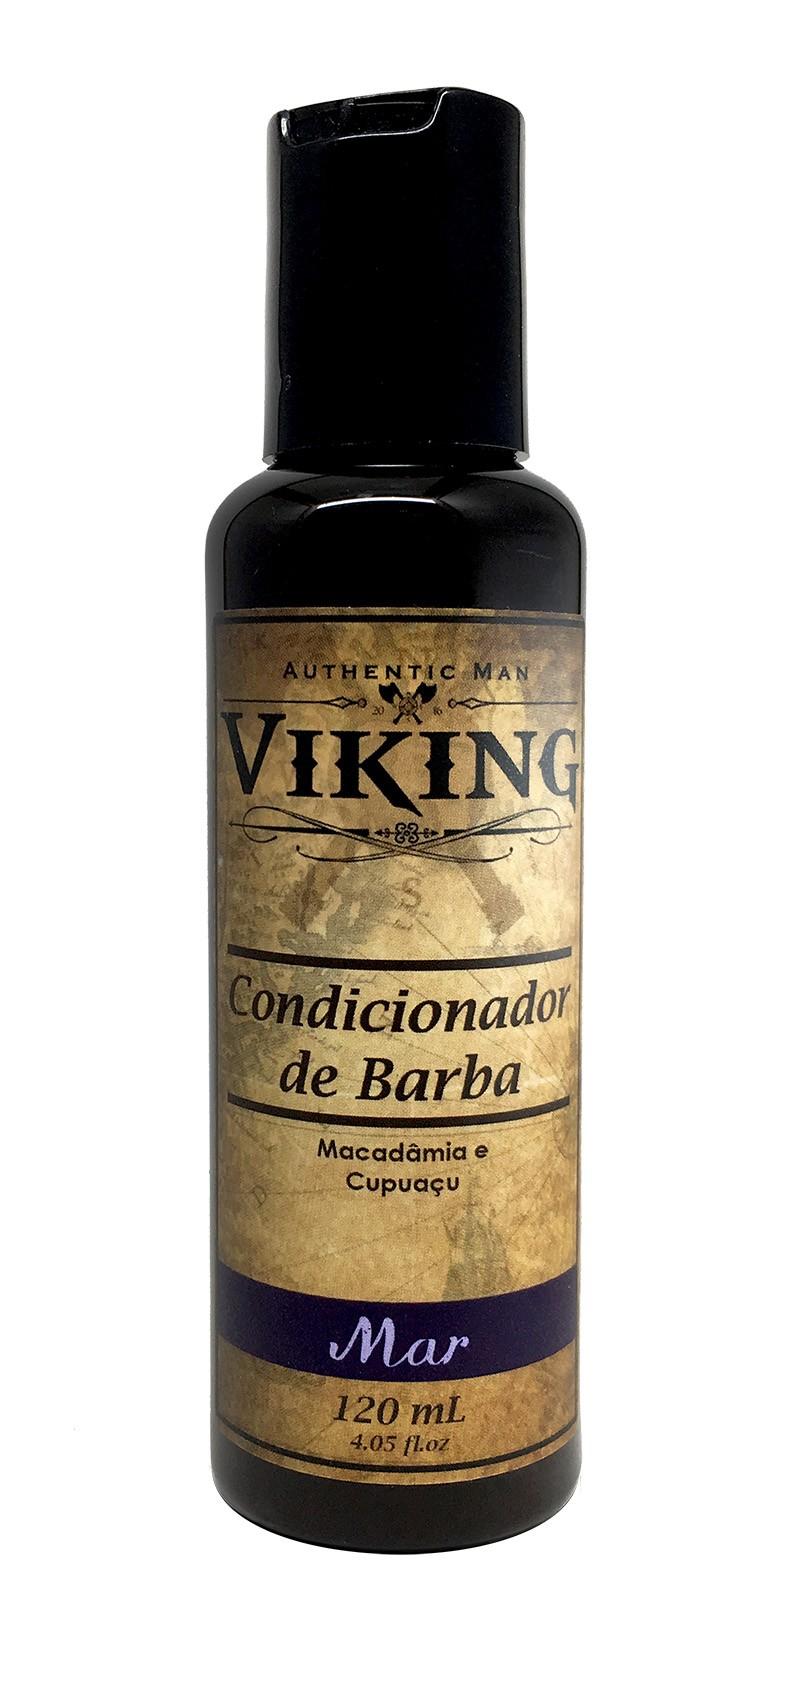 Condicionador de Barba - Mar - Viking 120 mL  - Viking